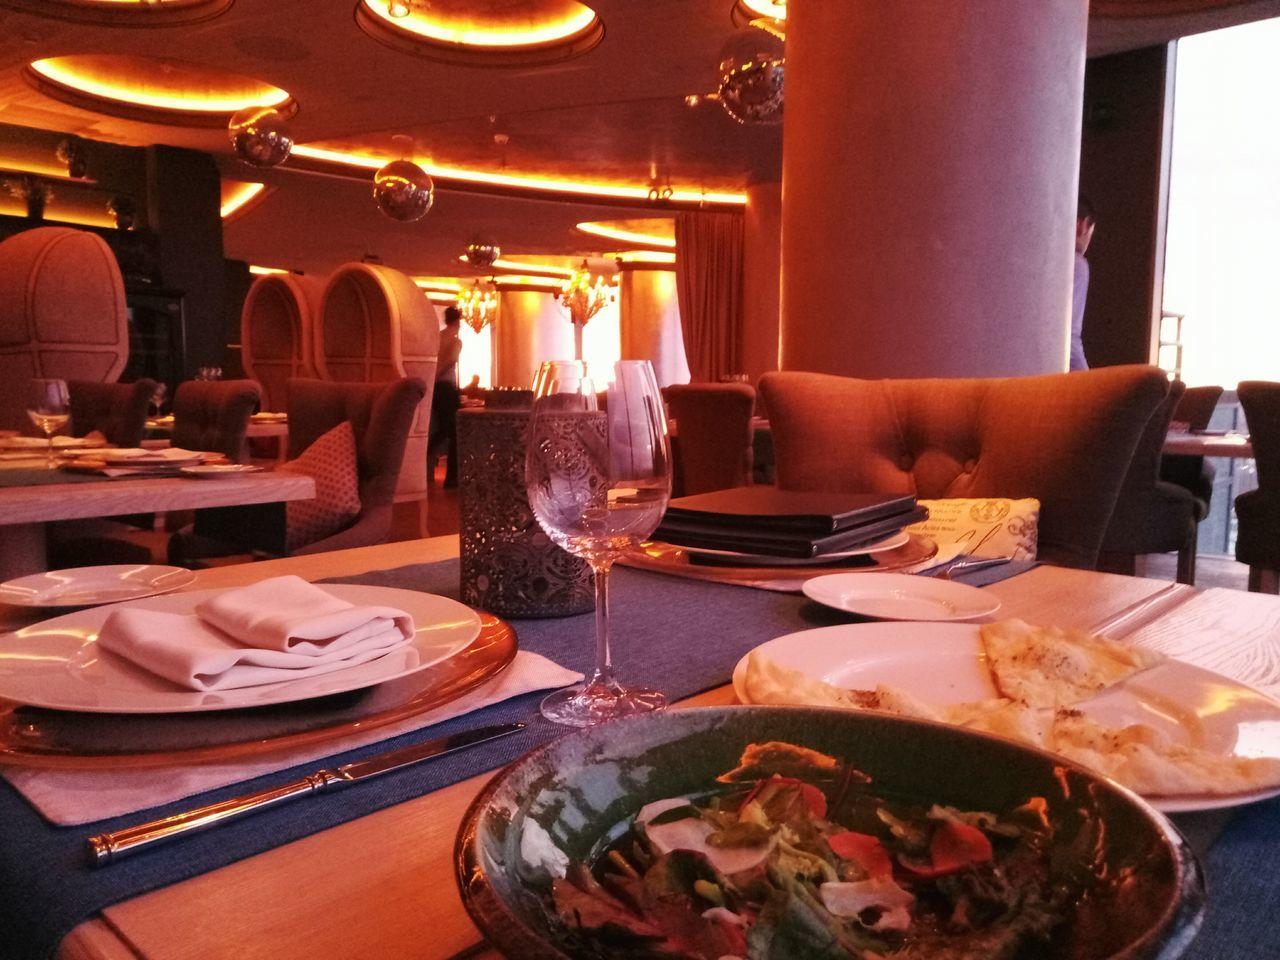 Ресторан Панорама Высоцкий Ekaterinburg Panorama Restaurant Restaurant Decor Restaurant Russian Restaurant Visockiy